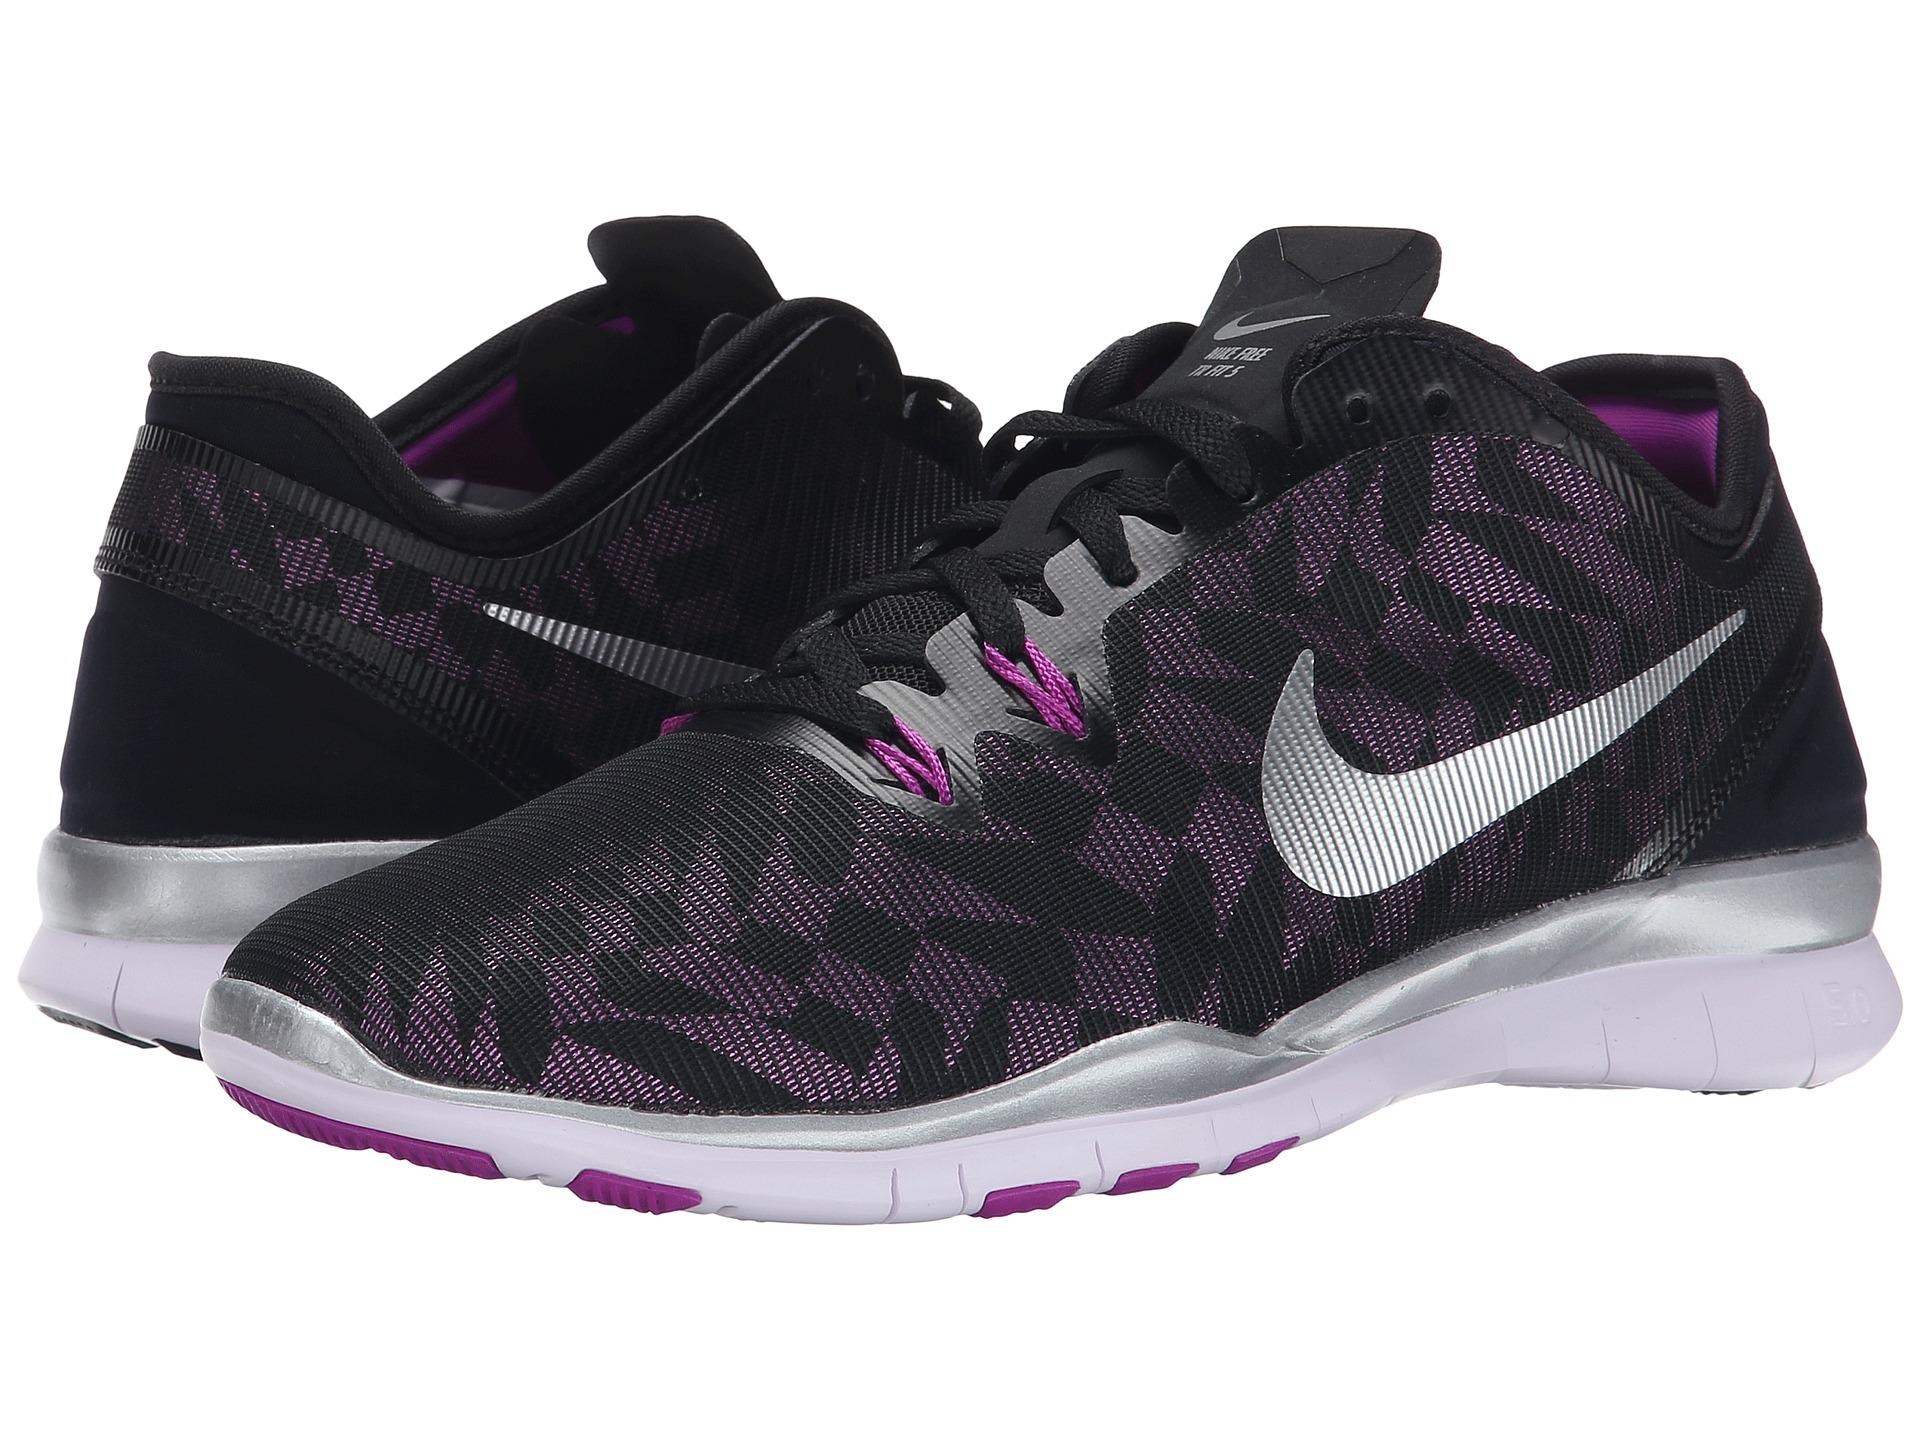 Free 5.0 Tr Fit Nike